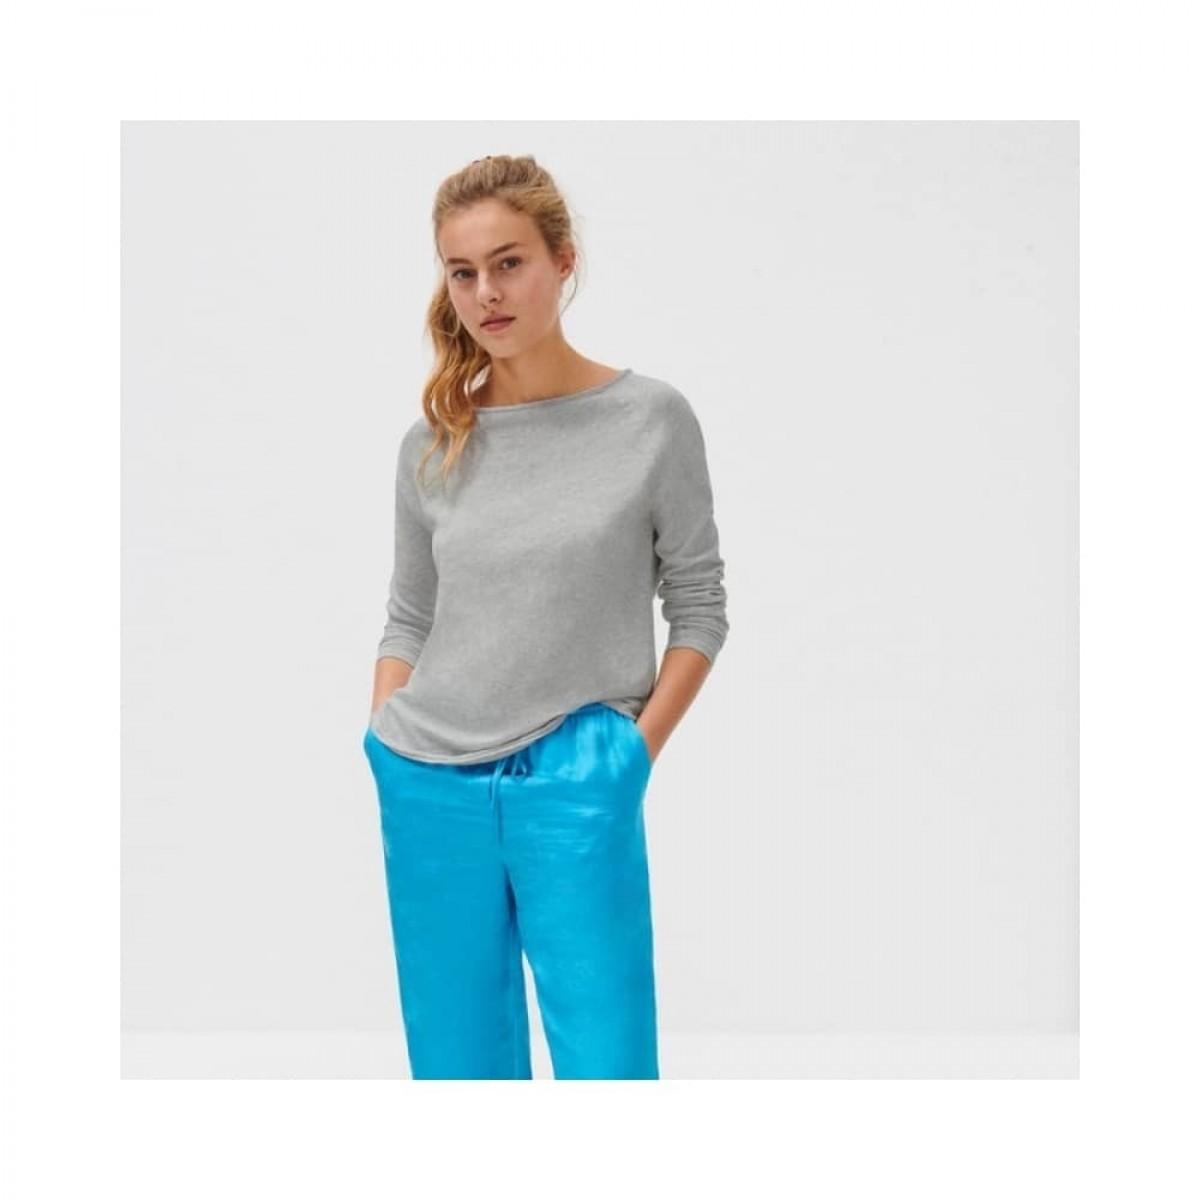 sonoma bluse - heather grey - model front